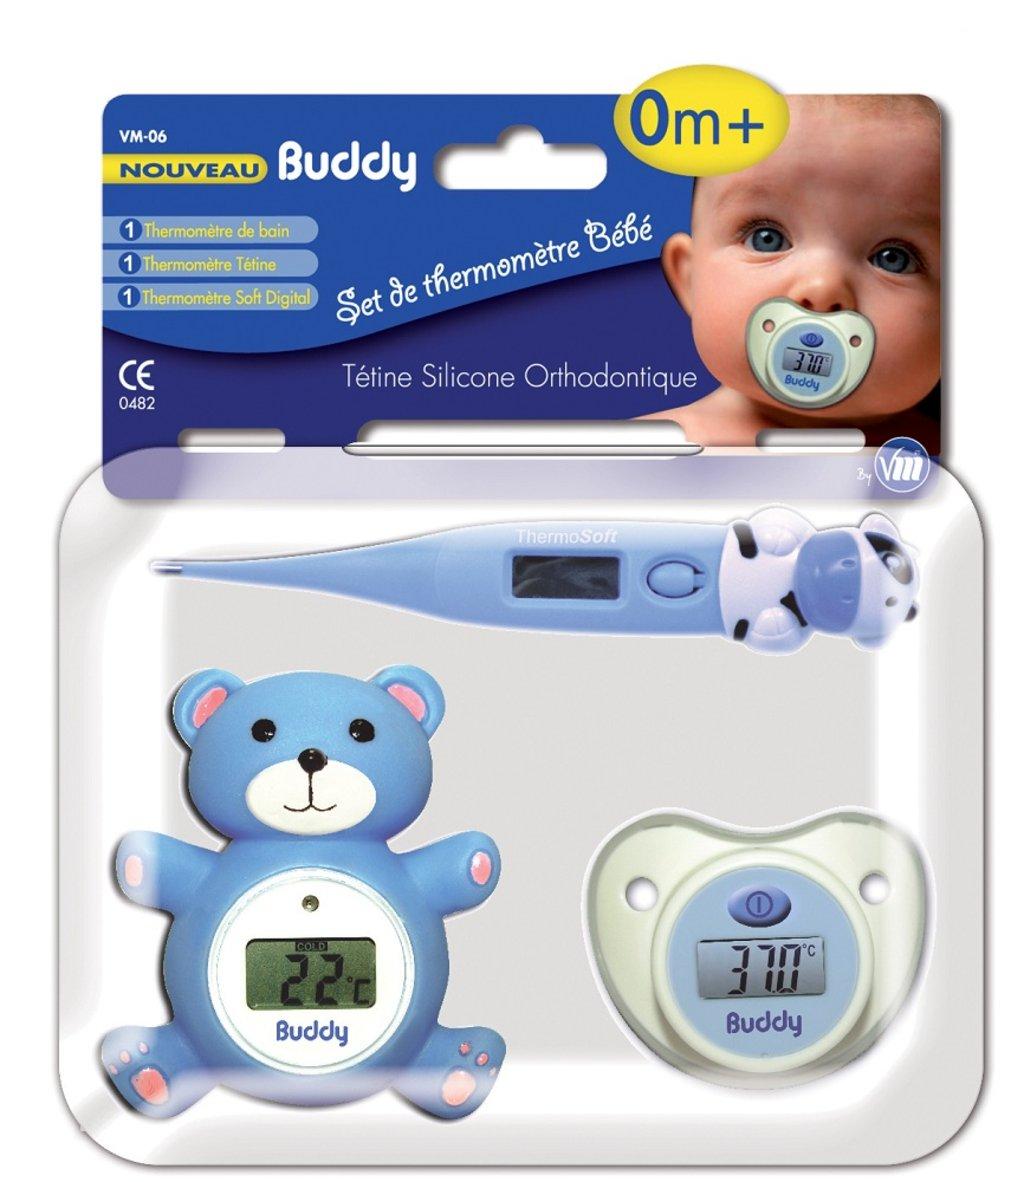 kit empreinte bébé aubert